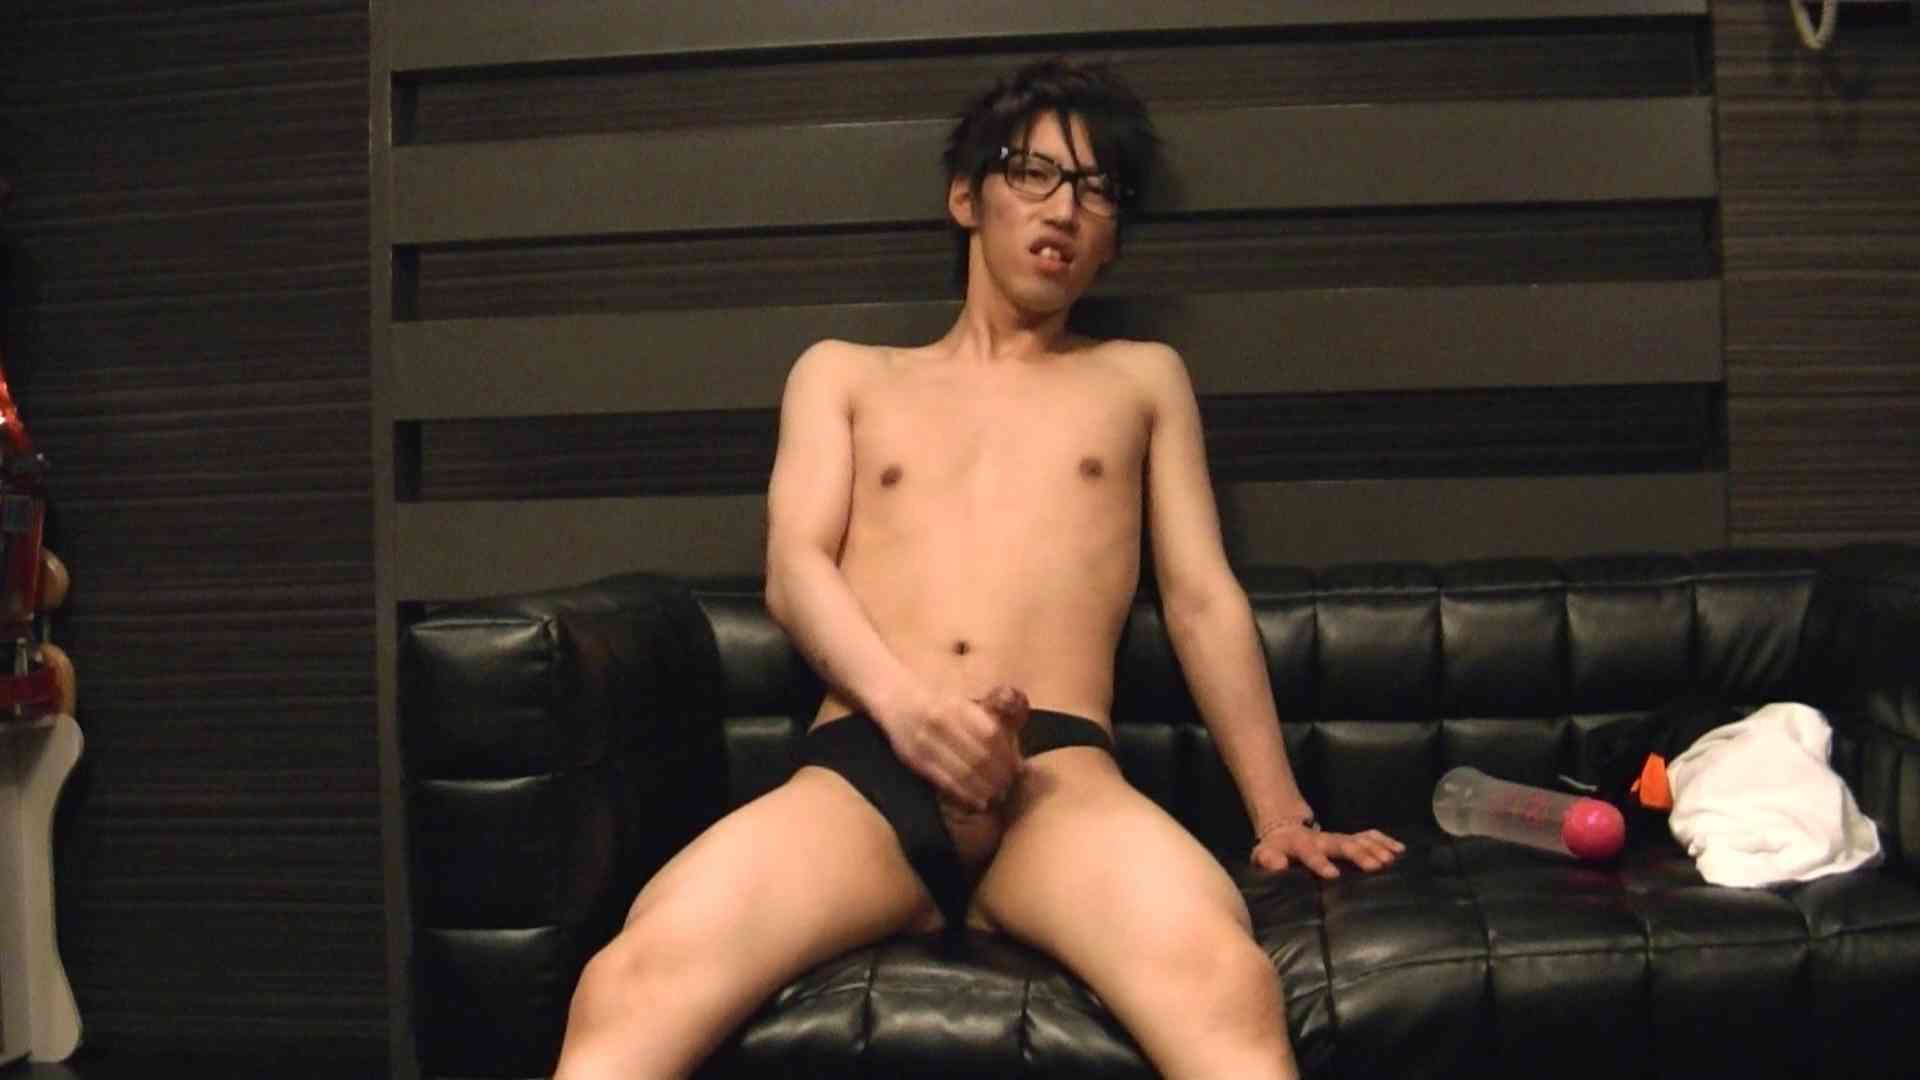 Mr.オナックスさん投稿!HD 貴方のオナニー三万円で撮影させてください。VOL.04 スリム美少年系ジャニ系 ゲイエロビデオ画像 55連発 55